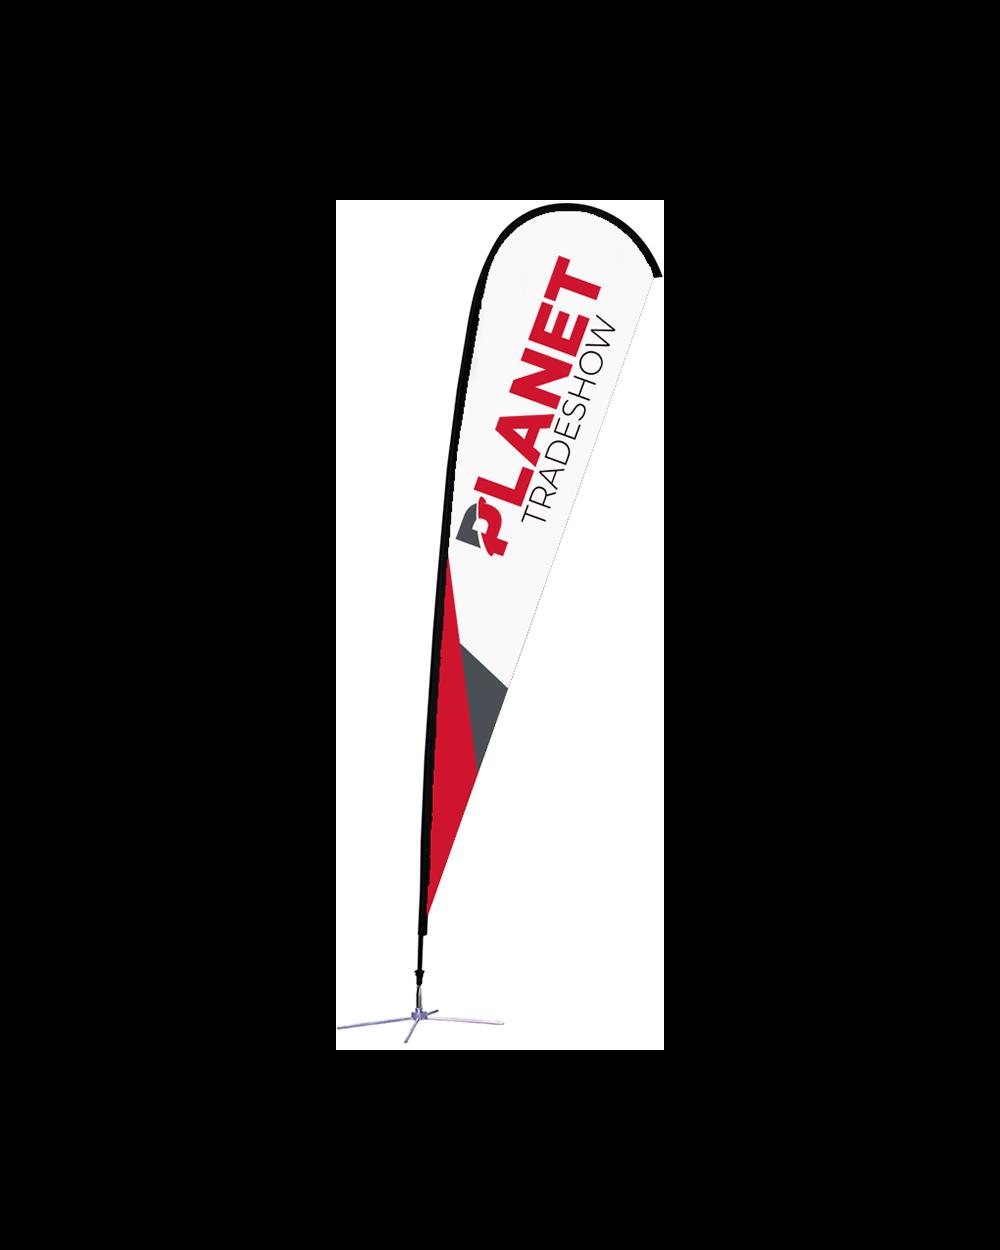 15ft Single-Sided Teardrop Flag